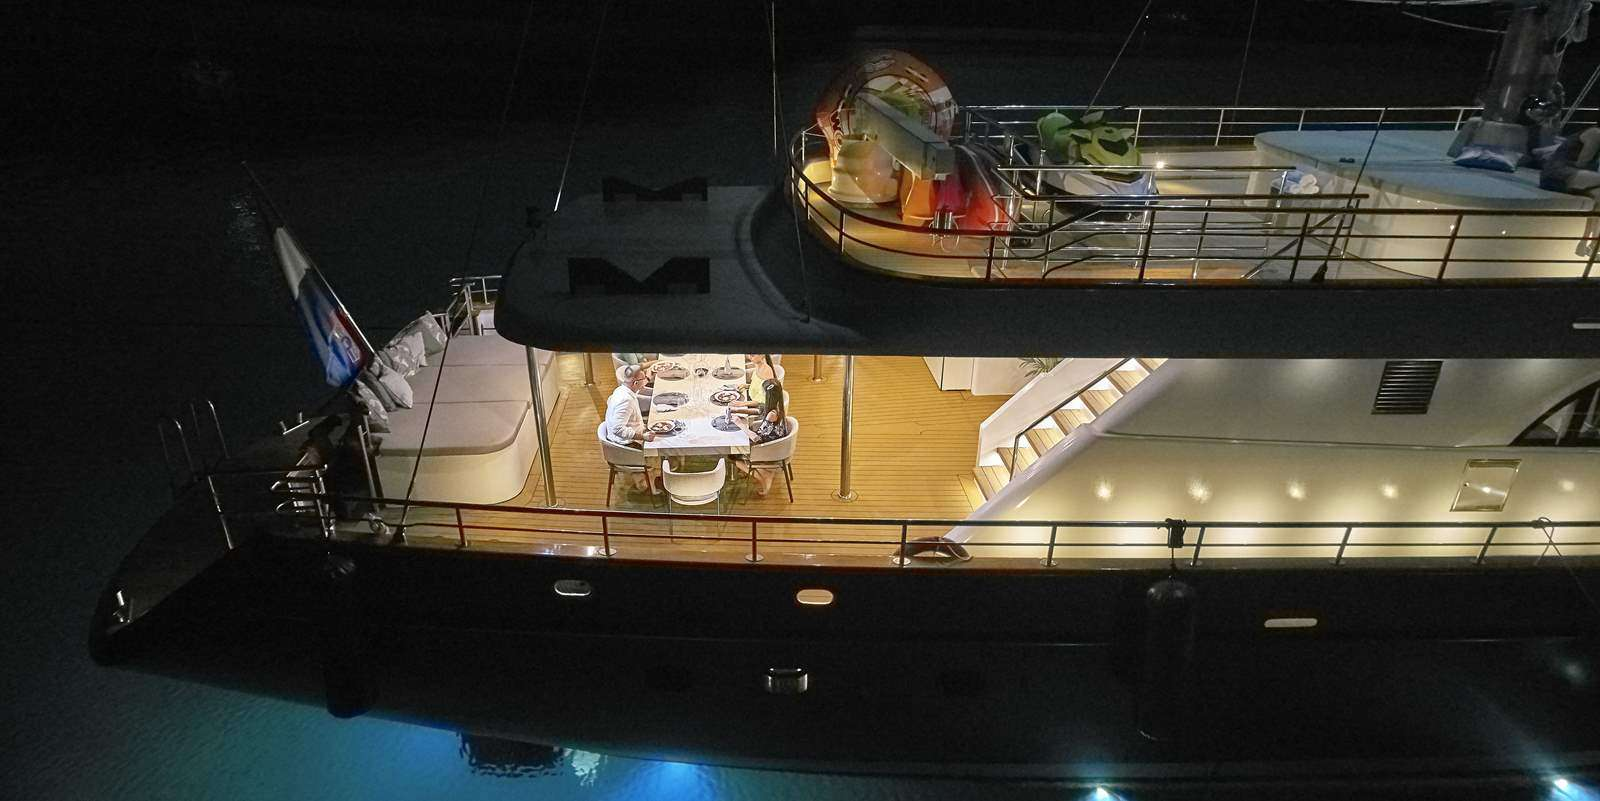 Image of Dalmatino yacht #13